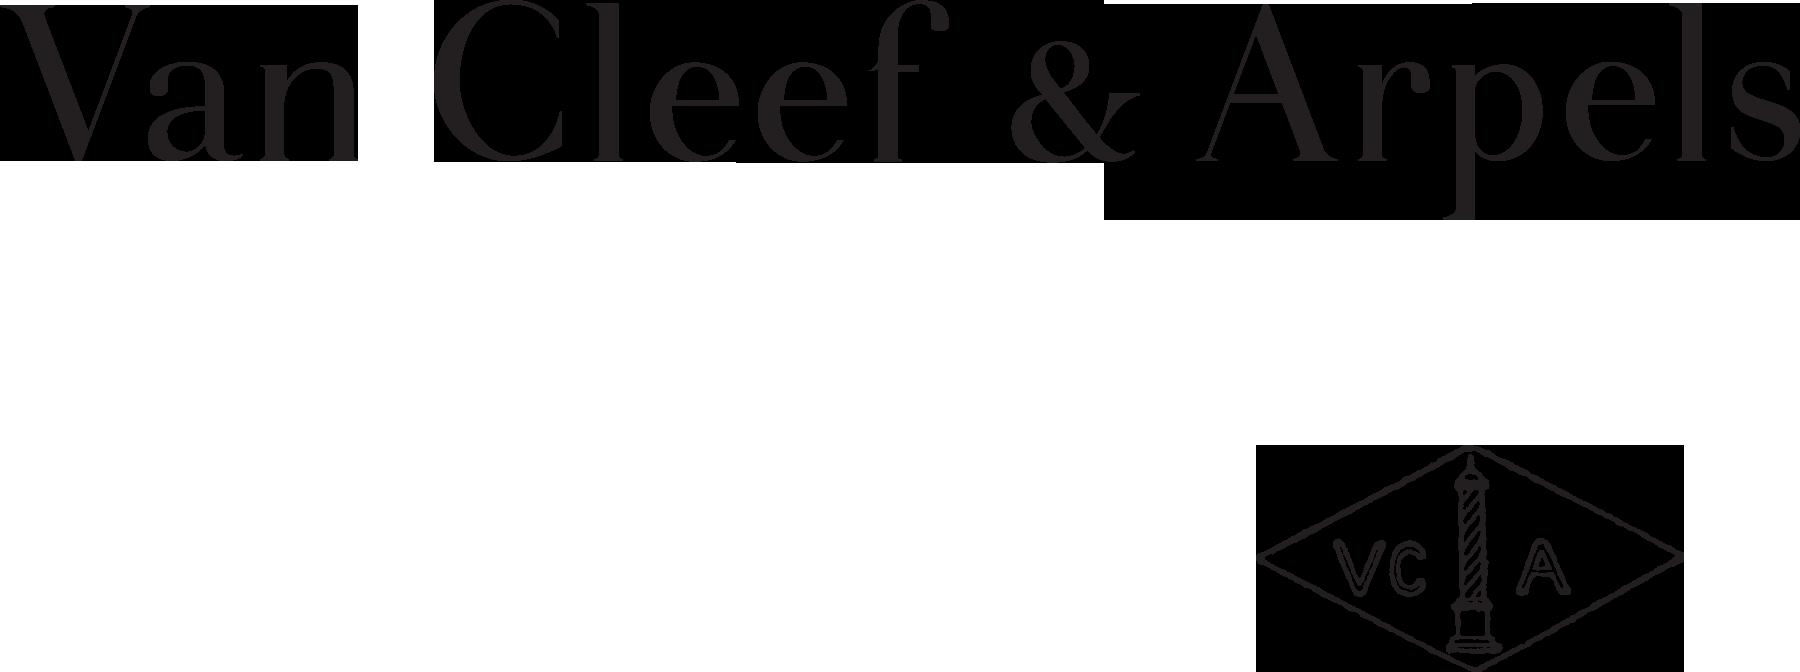 VAN CLEEF & ARPELS - PUBLIC RELATIONS INTERN in New York ...